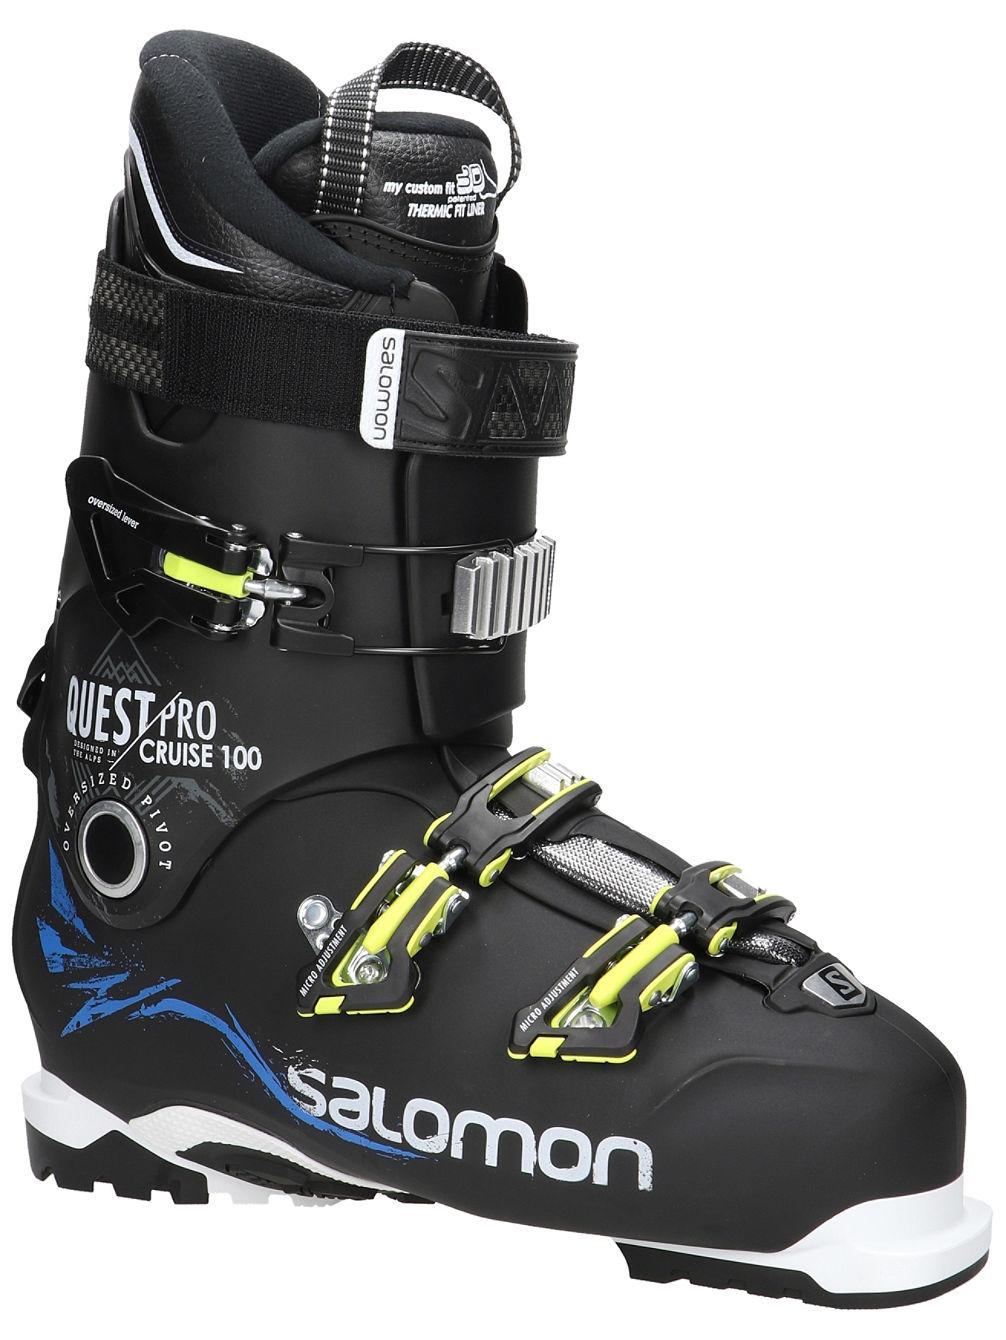 a3d4df30f90 Salomon Quest Pro Cruise 100 2019 Skischoenen online kopen bij Blue Tomato